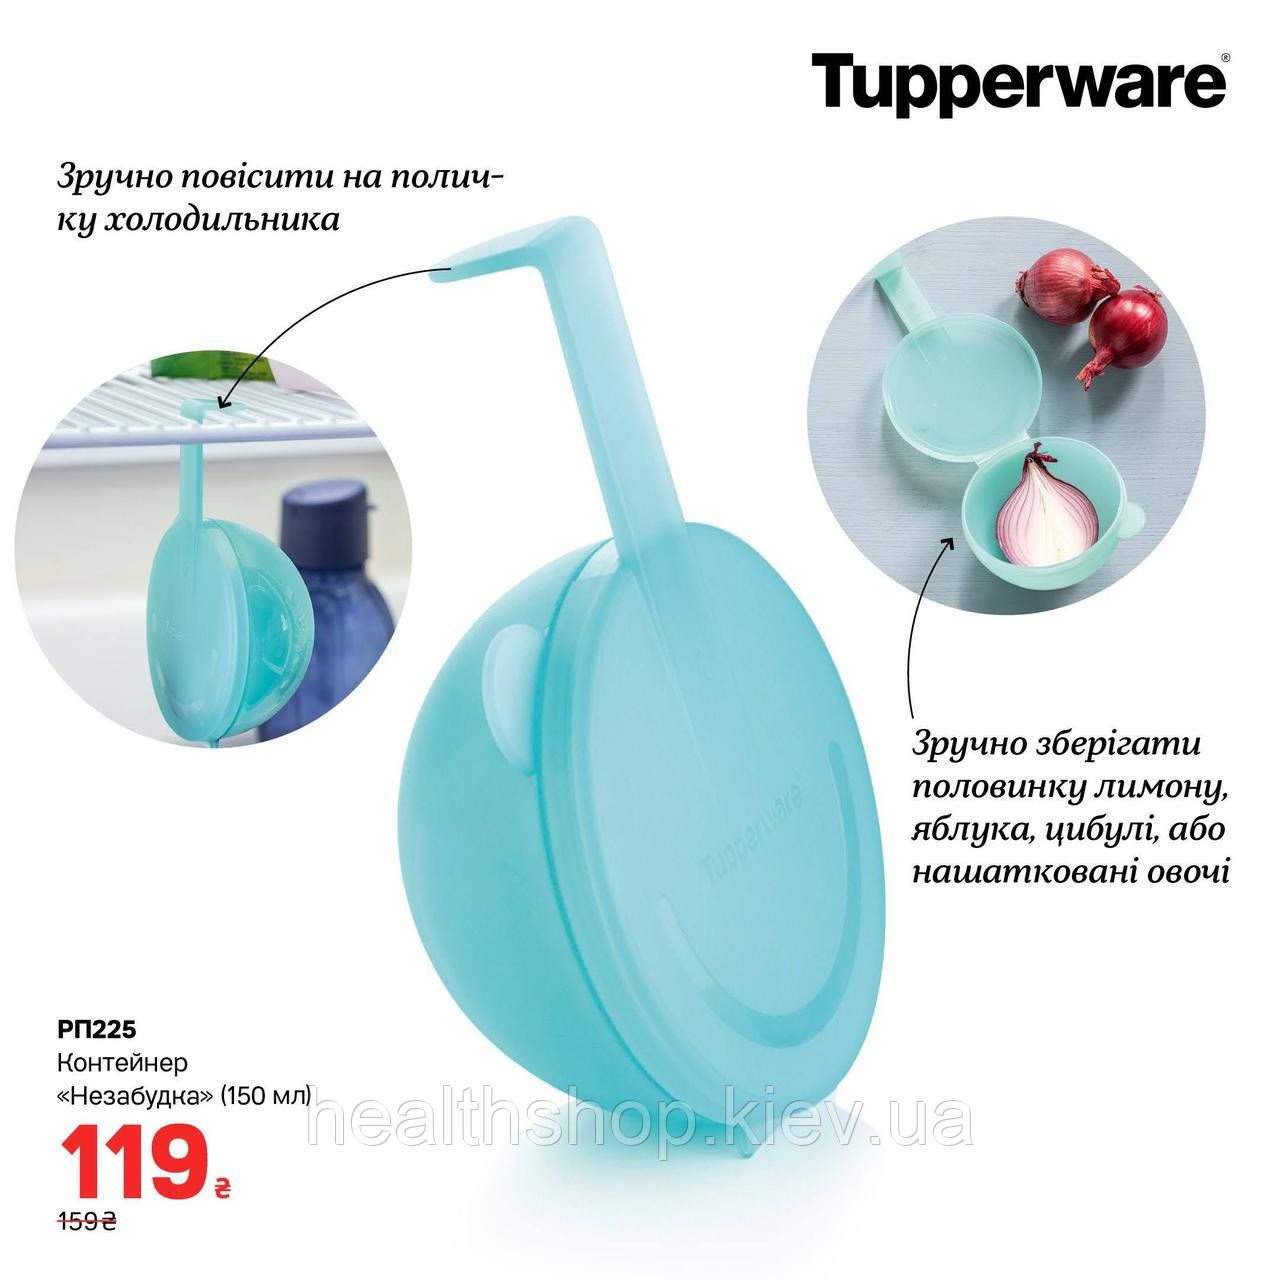 Контейнер Незабудка 150 мл Tupperware (Оригінал) Тапервер